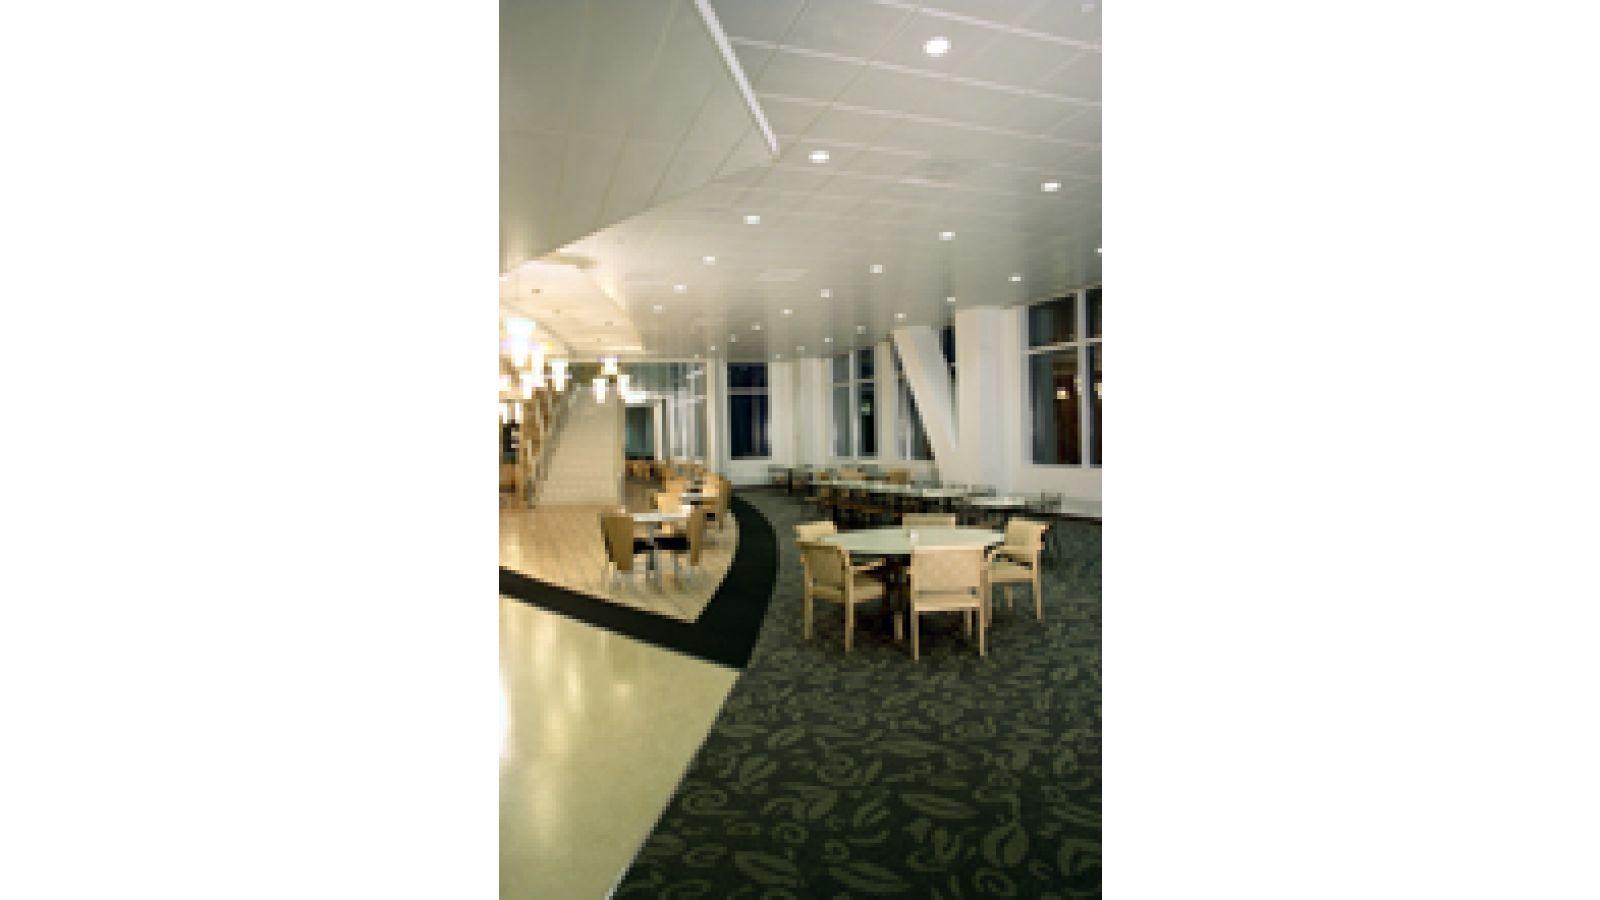 ROCKFON Planostile panels with flush reveal profile